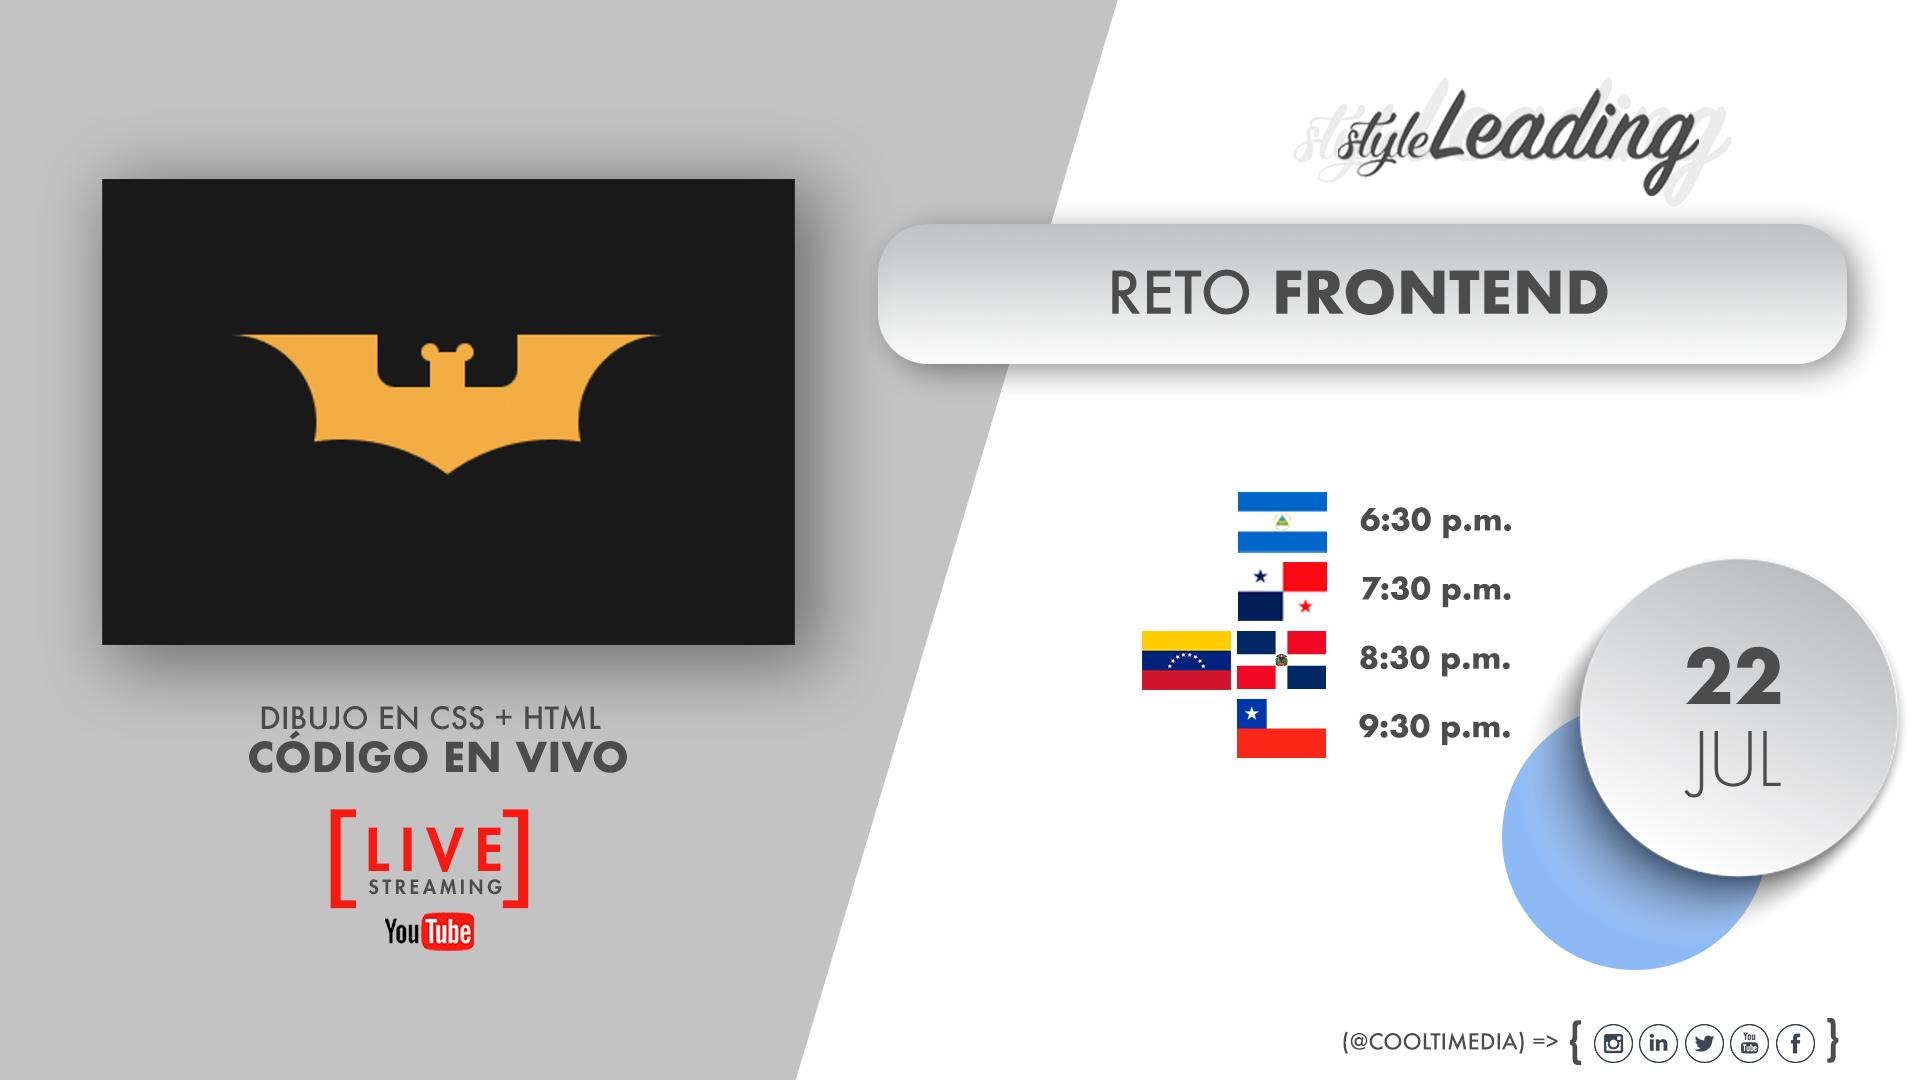 Reto FrontEnd StyleLeading Panamá